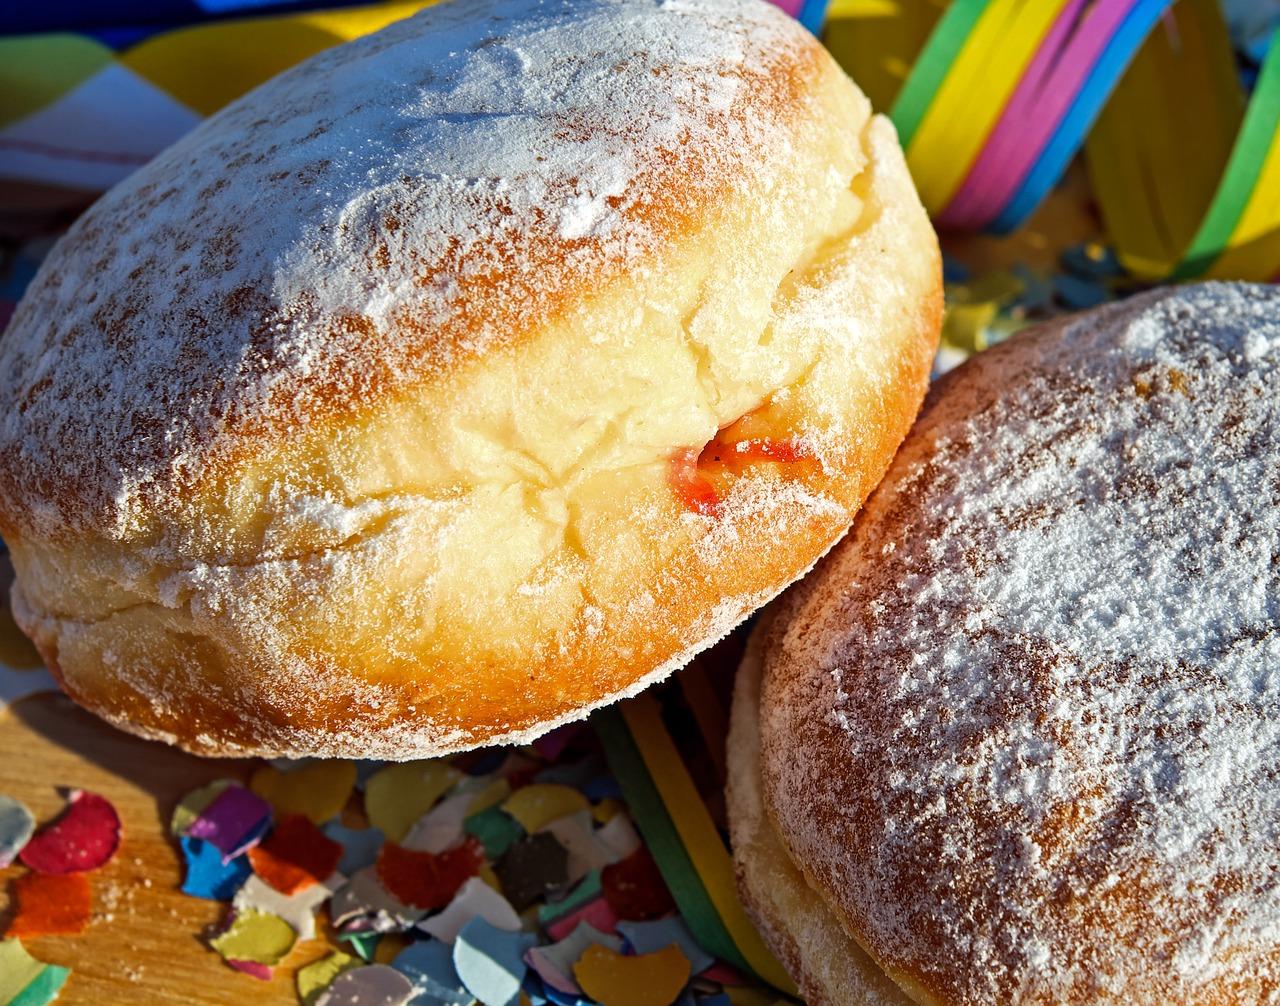 donut-3081959_1280.jpg